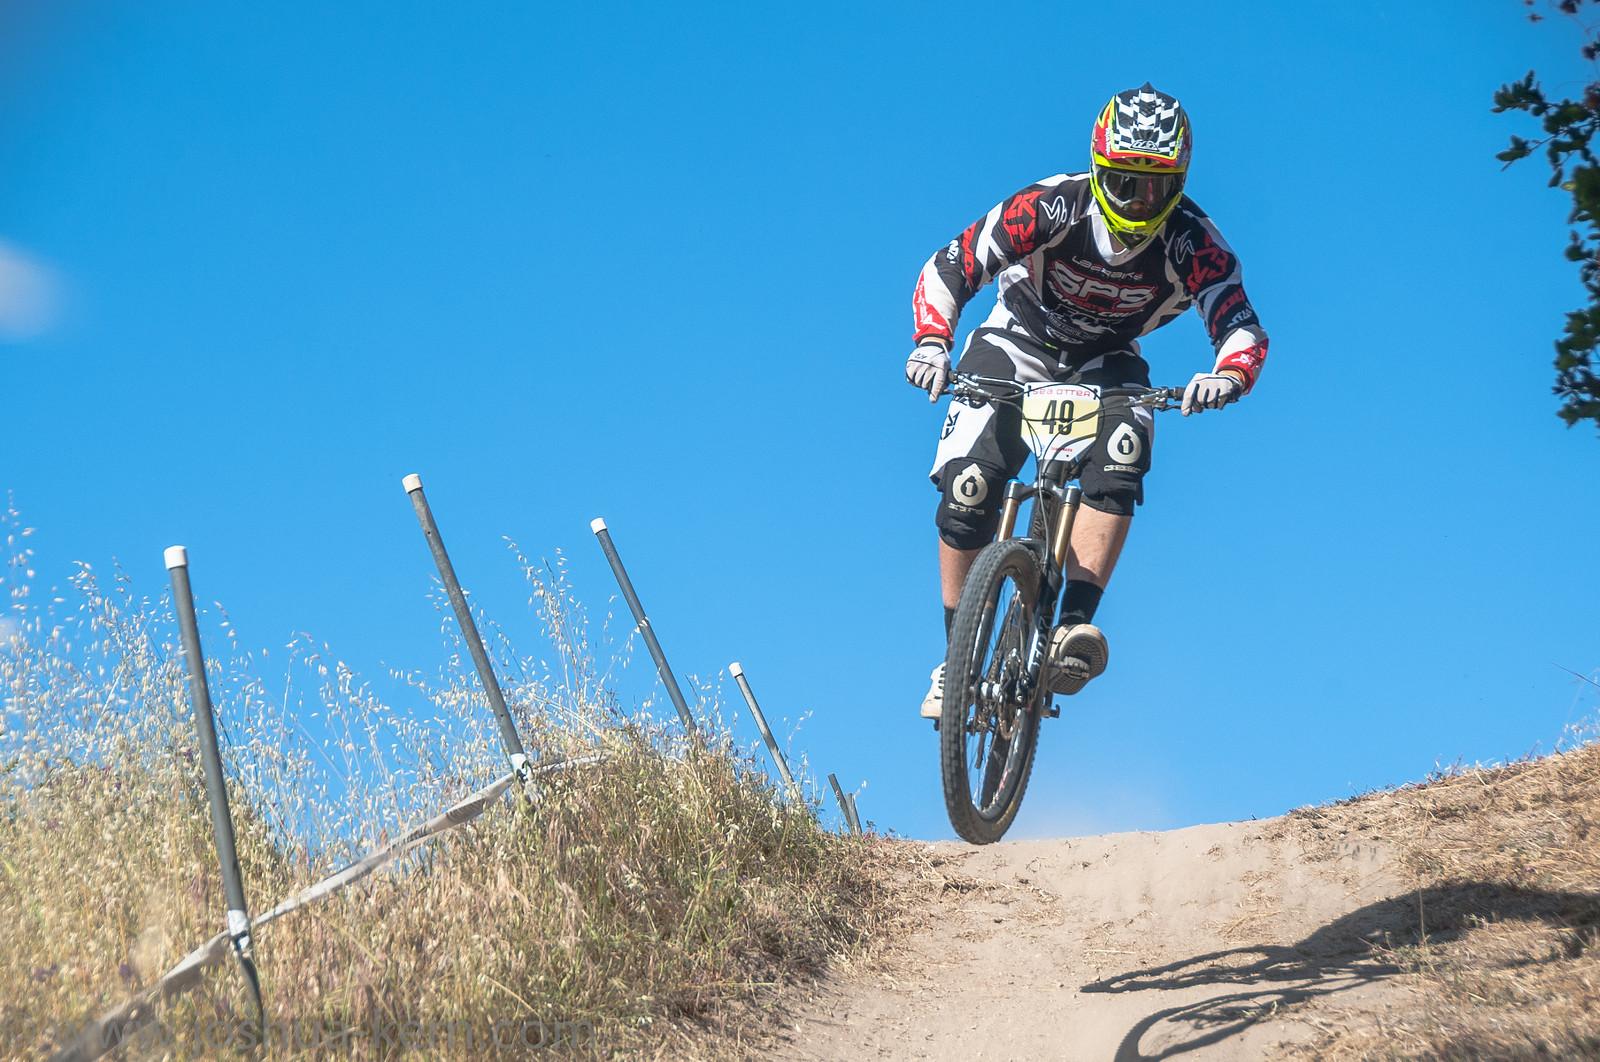 4-19-13DHPractice (28 of 36) - jkern620 - Mountain Biking Pictures - Vital MTB